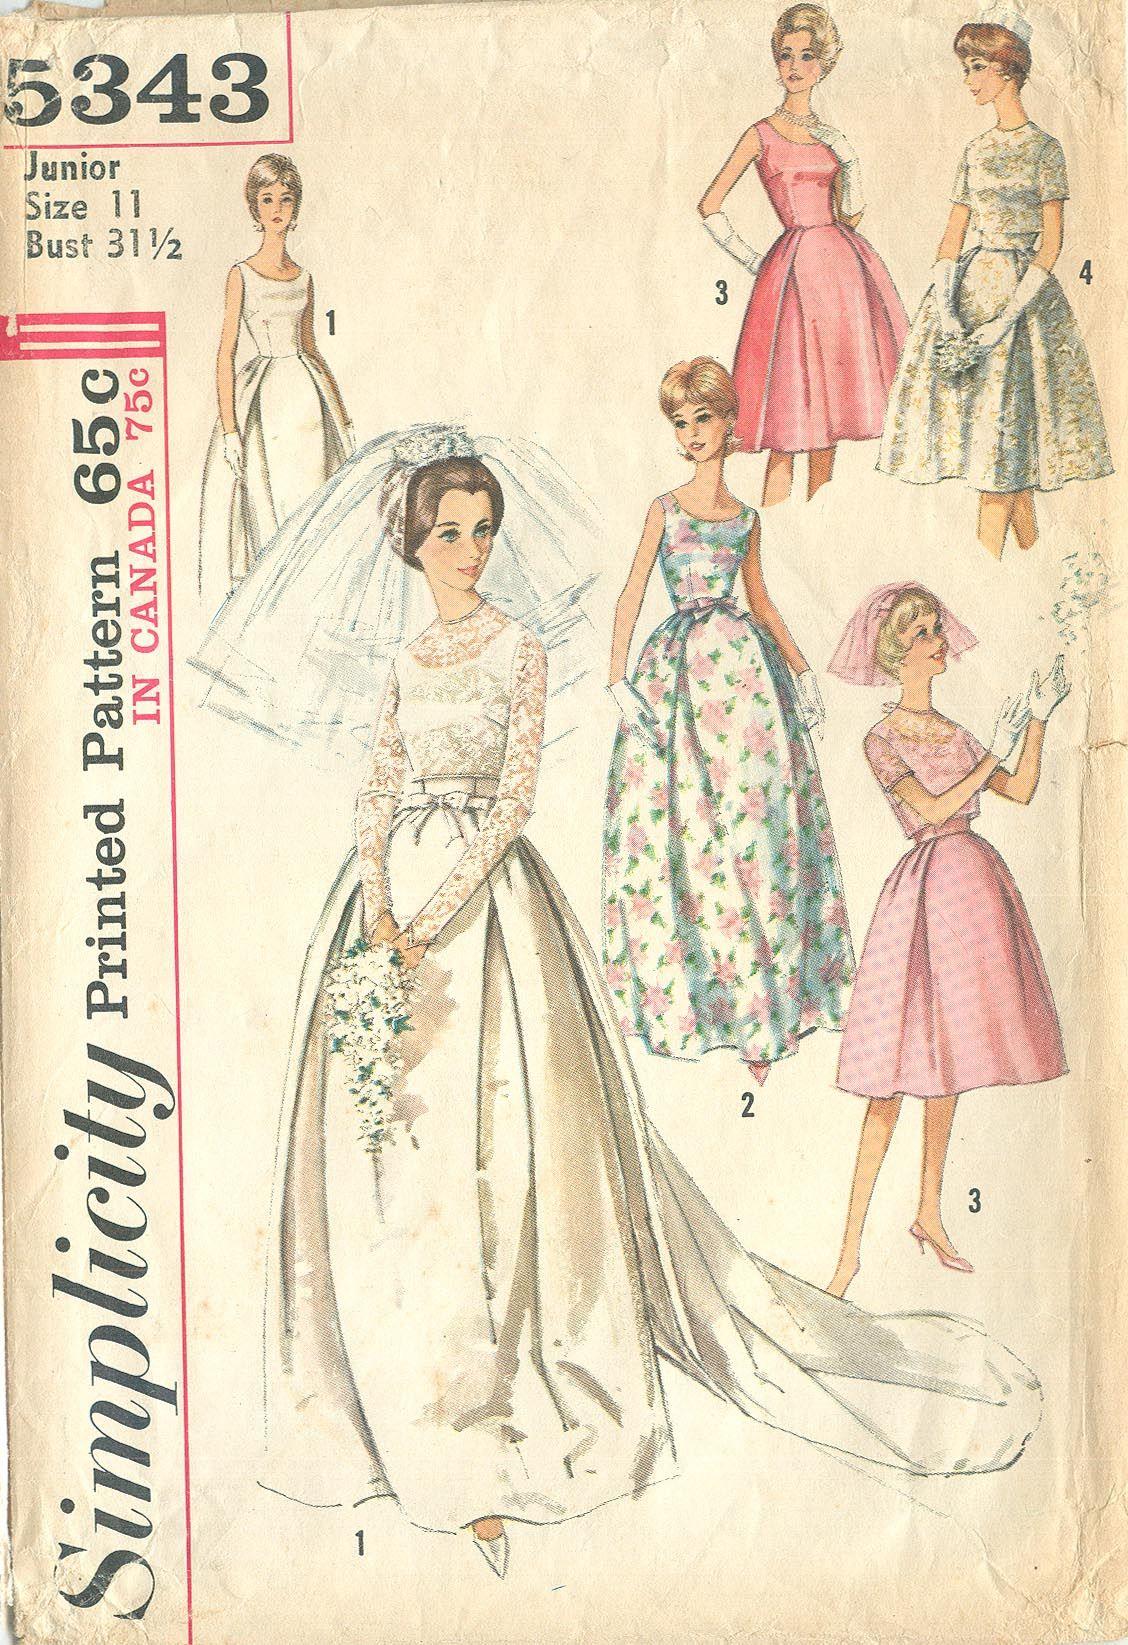 c437a1d65 Simplicity 5343 Vintage 1963 Mad Men Wedding Gown with Detachable Train B31  1/2